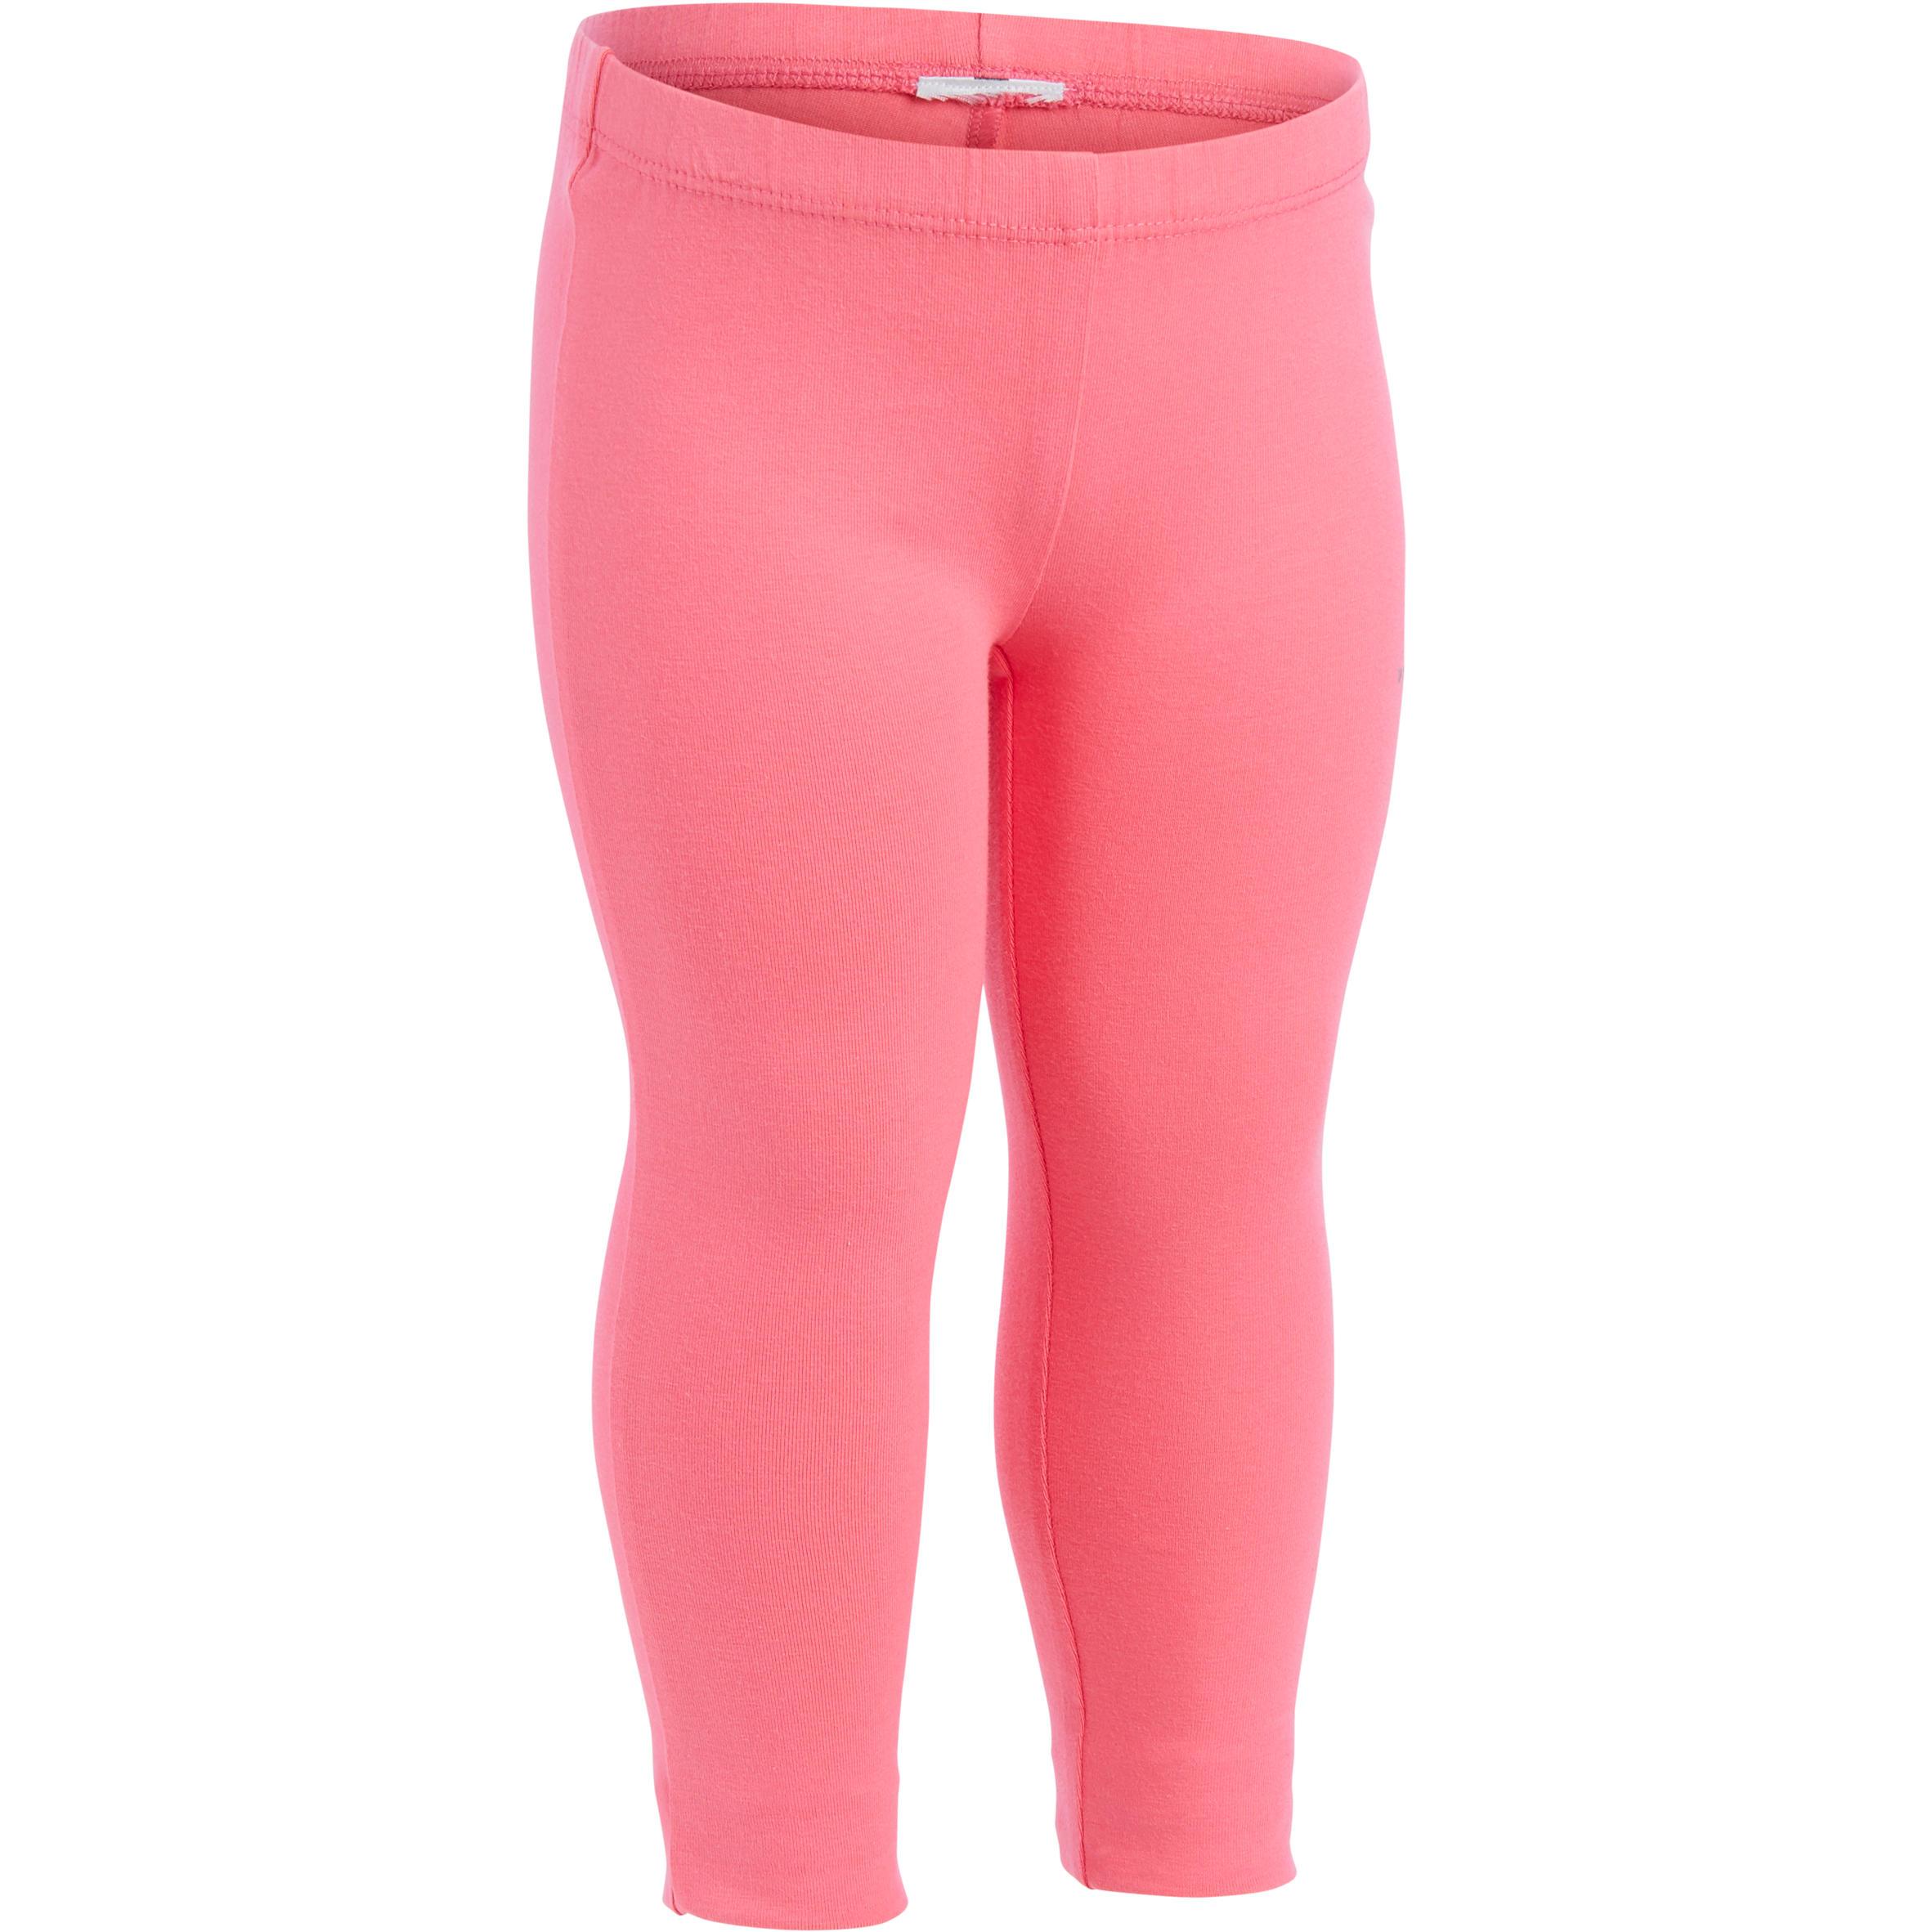 100 Girls' Baby Gym Leggings Twin-Pack - Pink Print